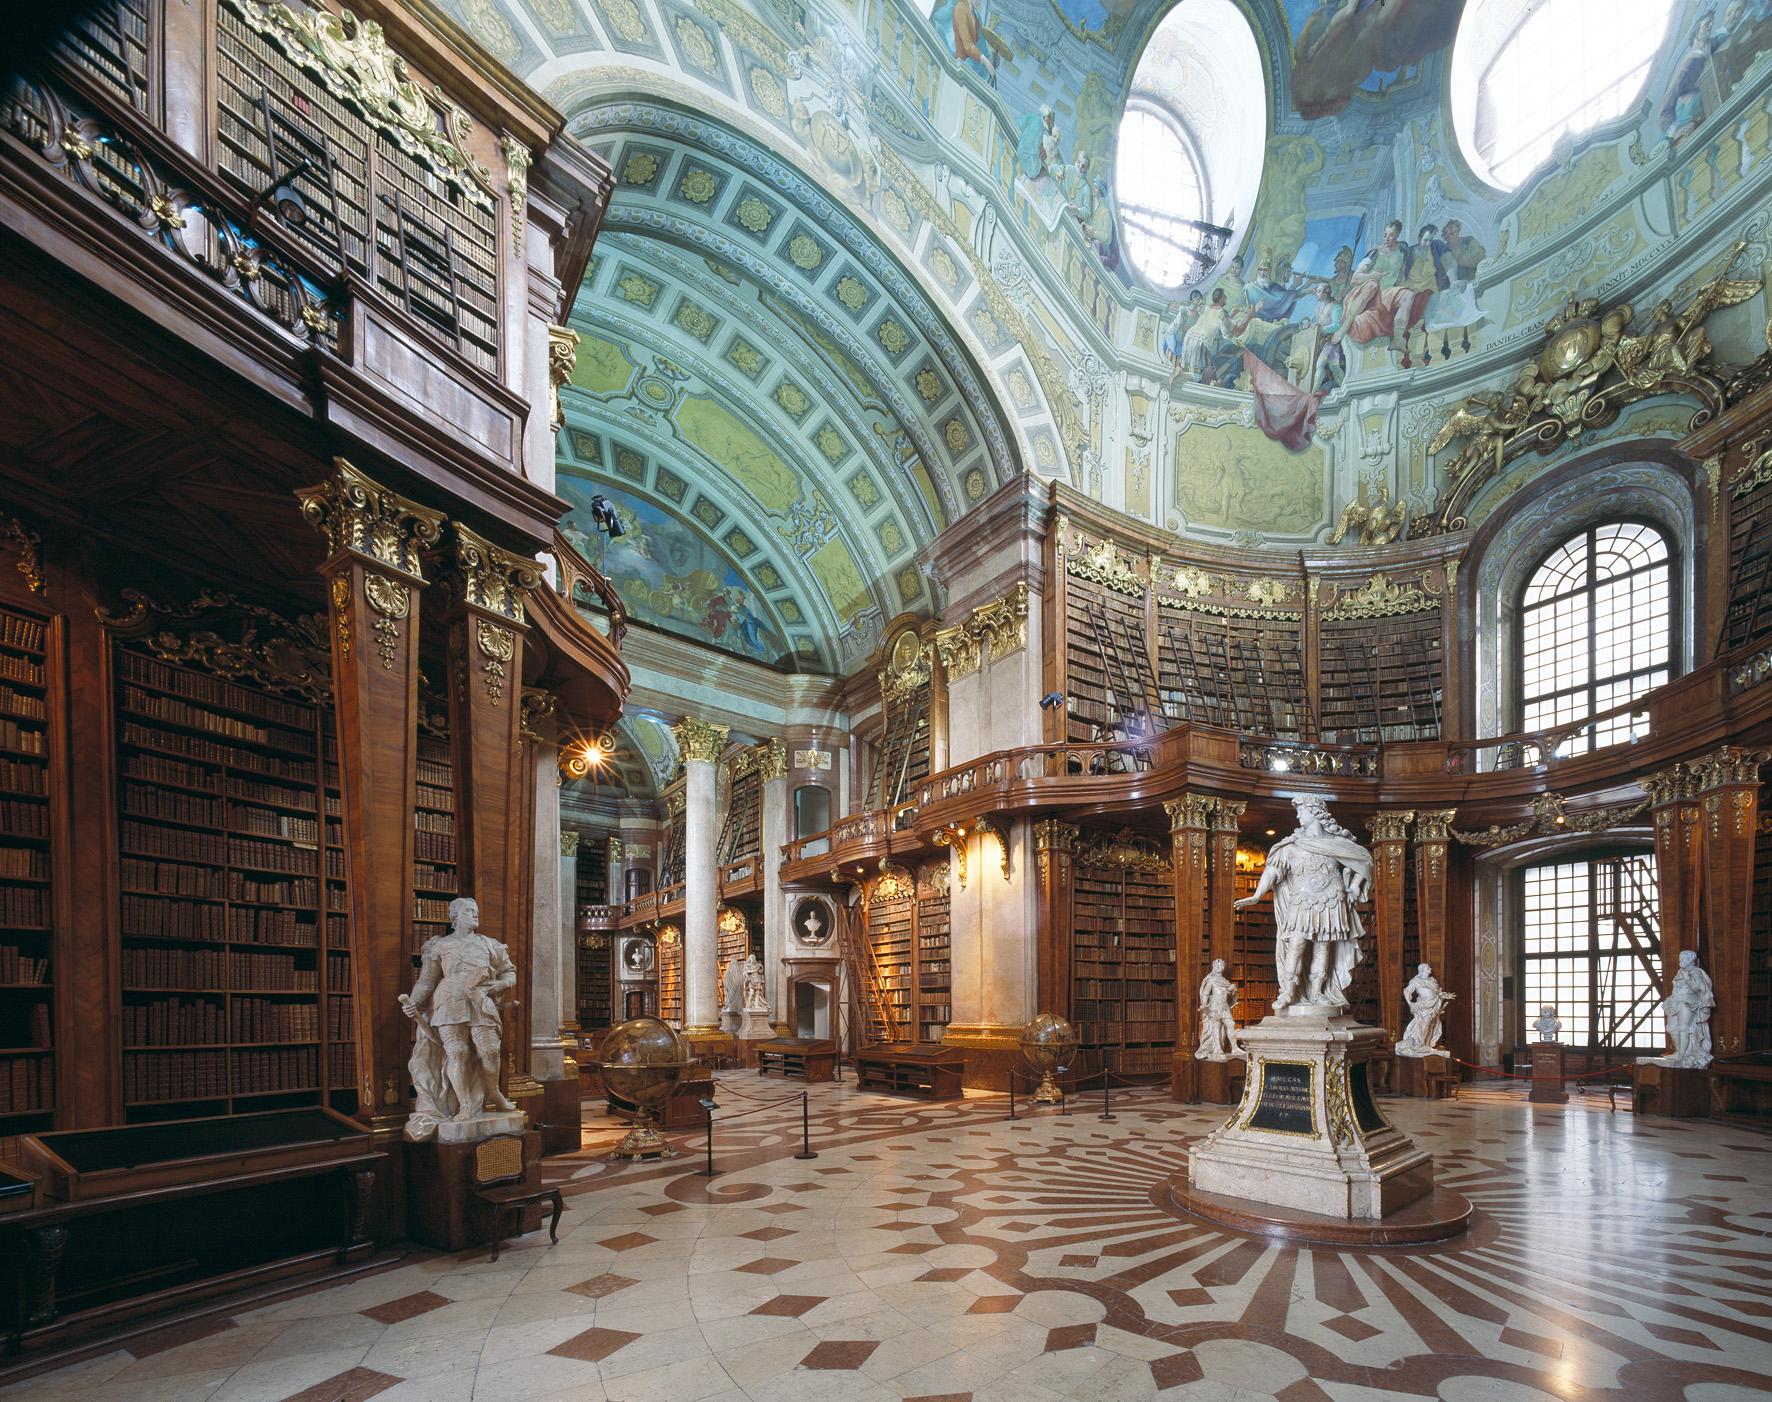 Svečana dvorana_2© Hejduk_Österreichische Nationalbibliothek